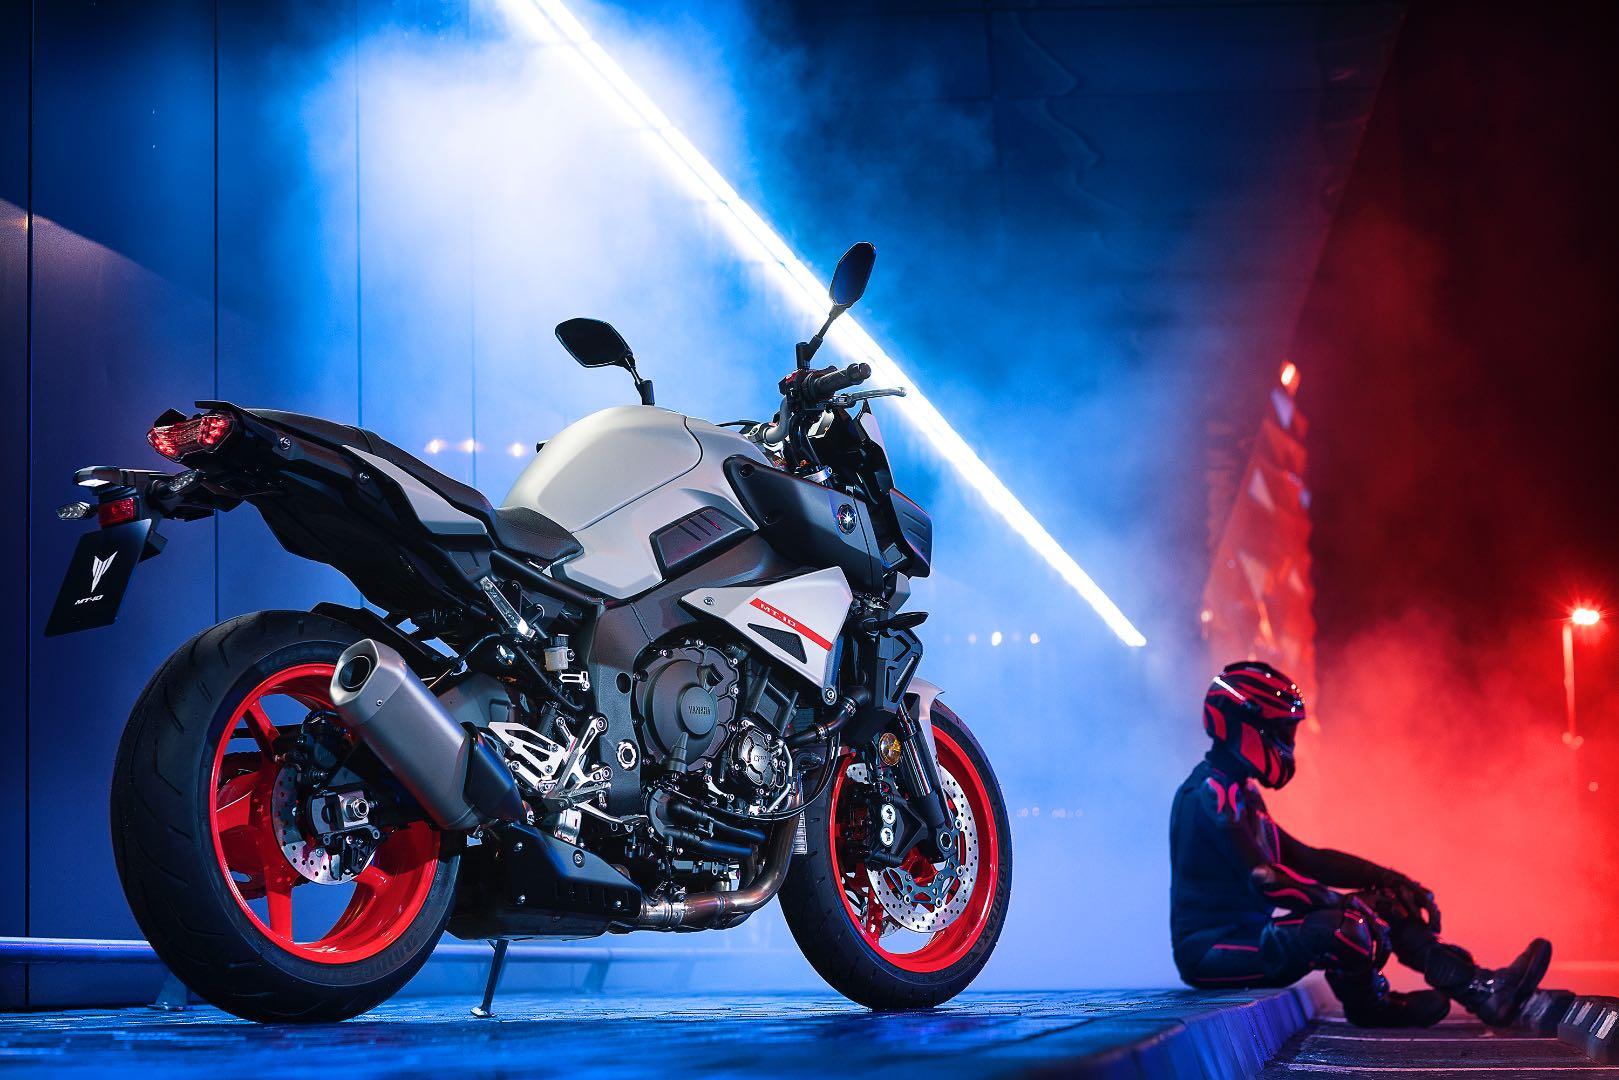 2019 Yamaha Hyper Naked Lineup First Look Mt 10 Mt 09 Mt 07